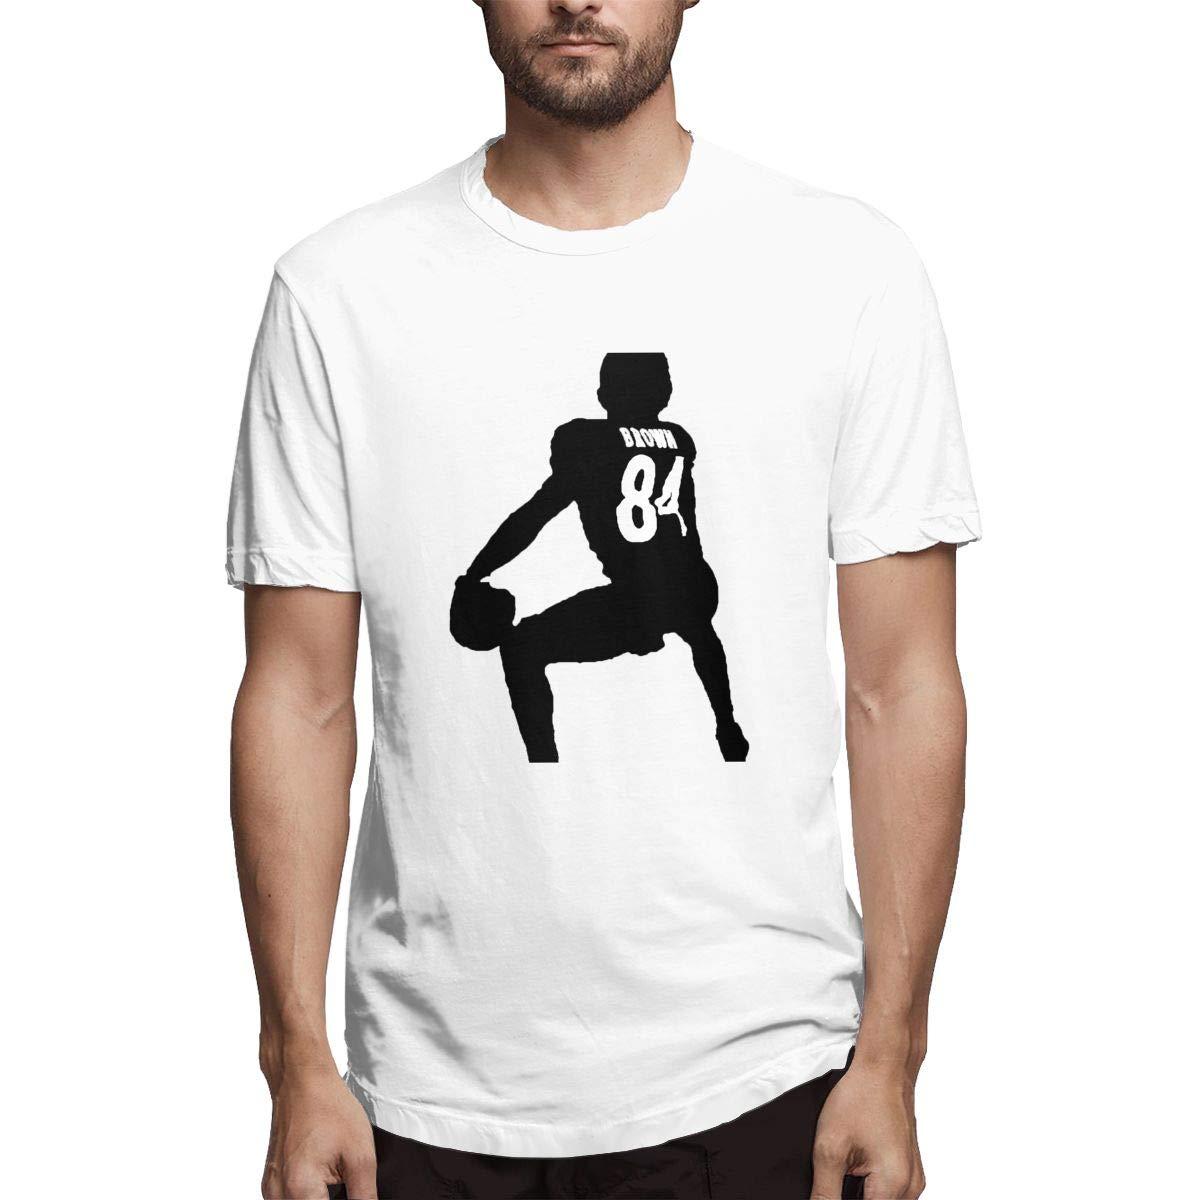 S Short Sleeve Antoniobrownart Crew Neck Tshirt